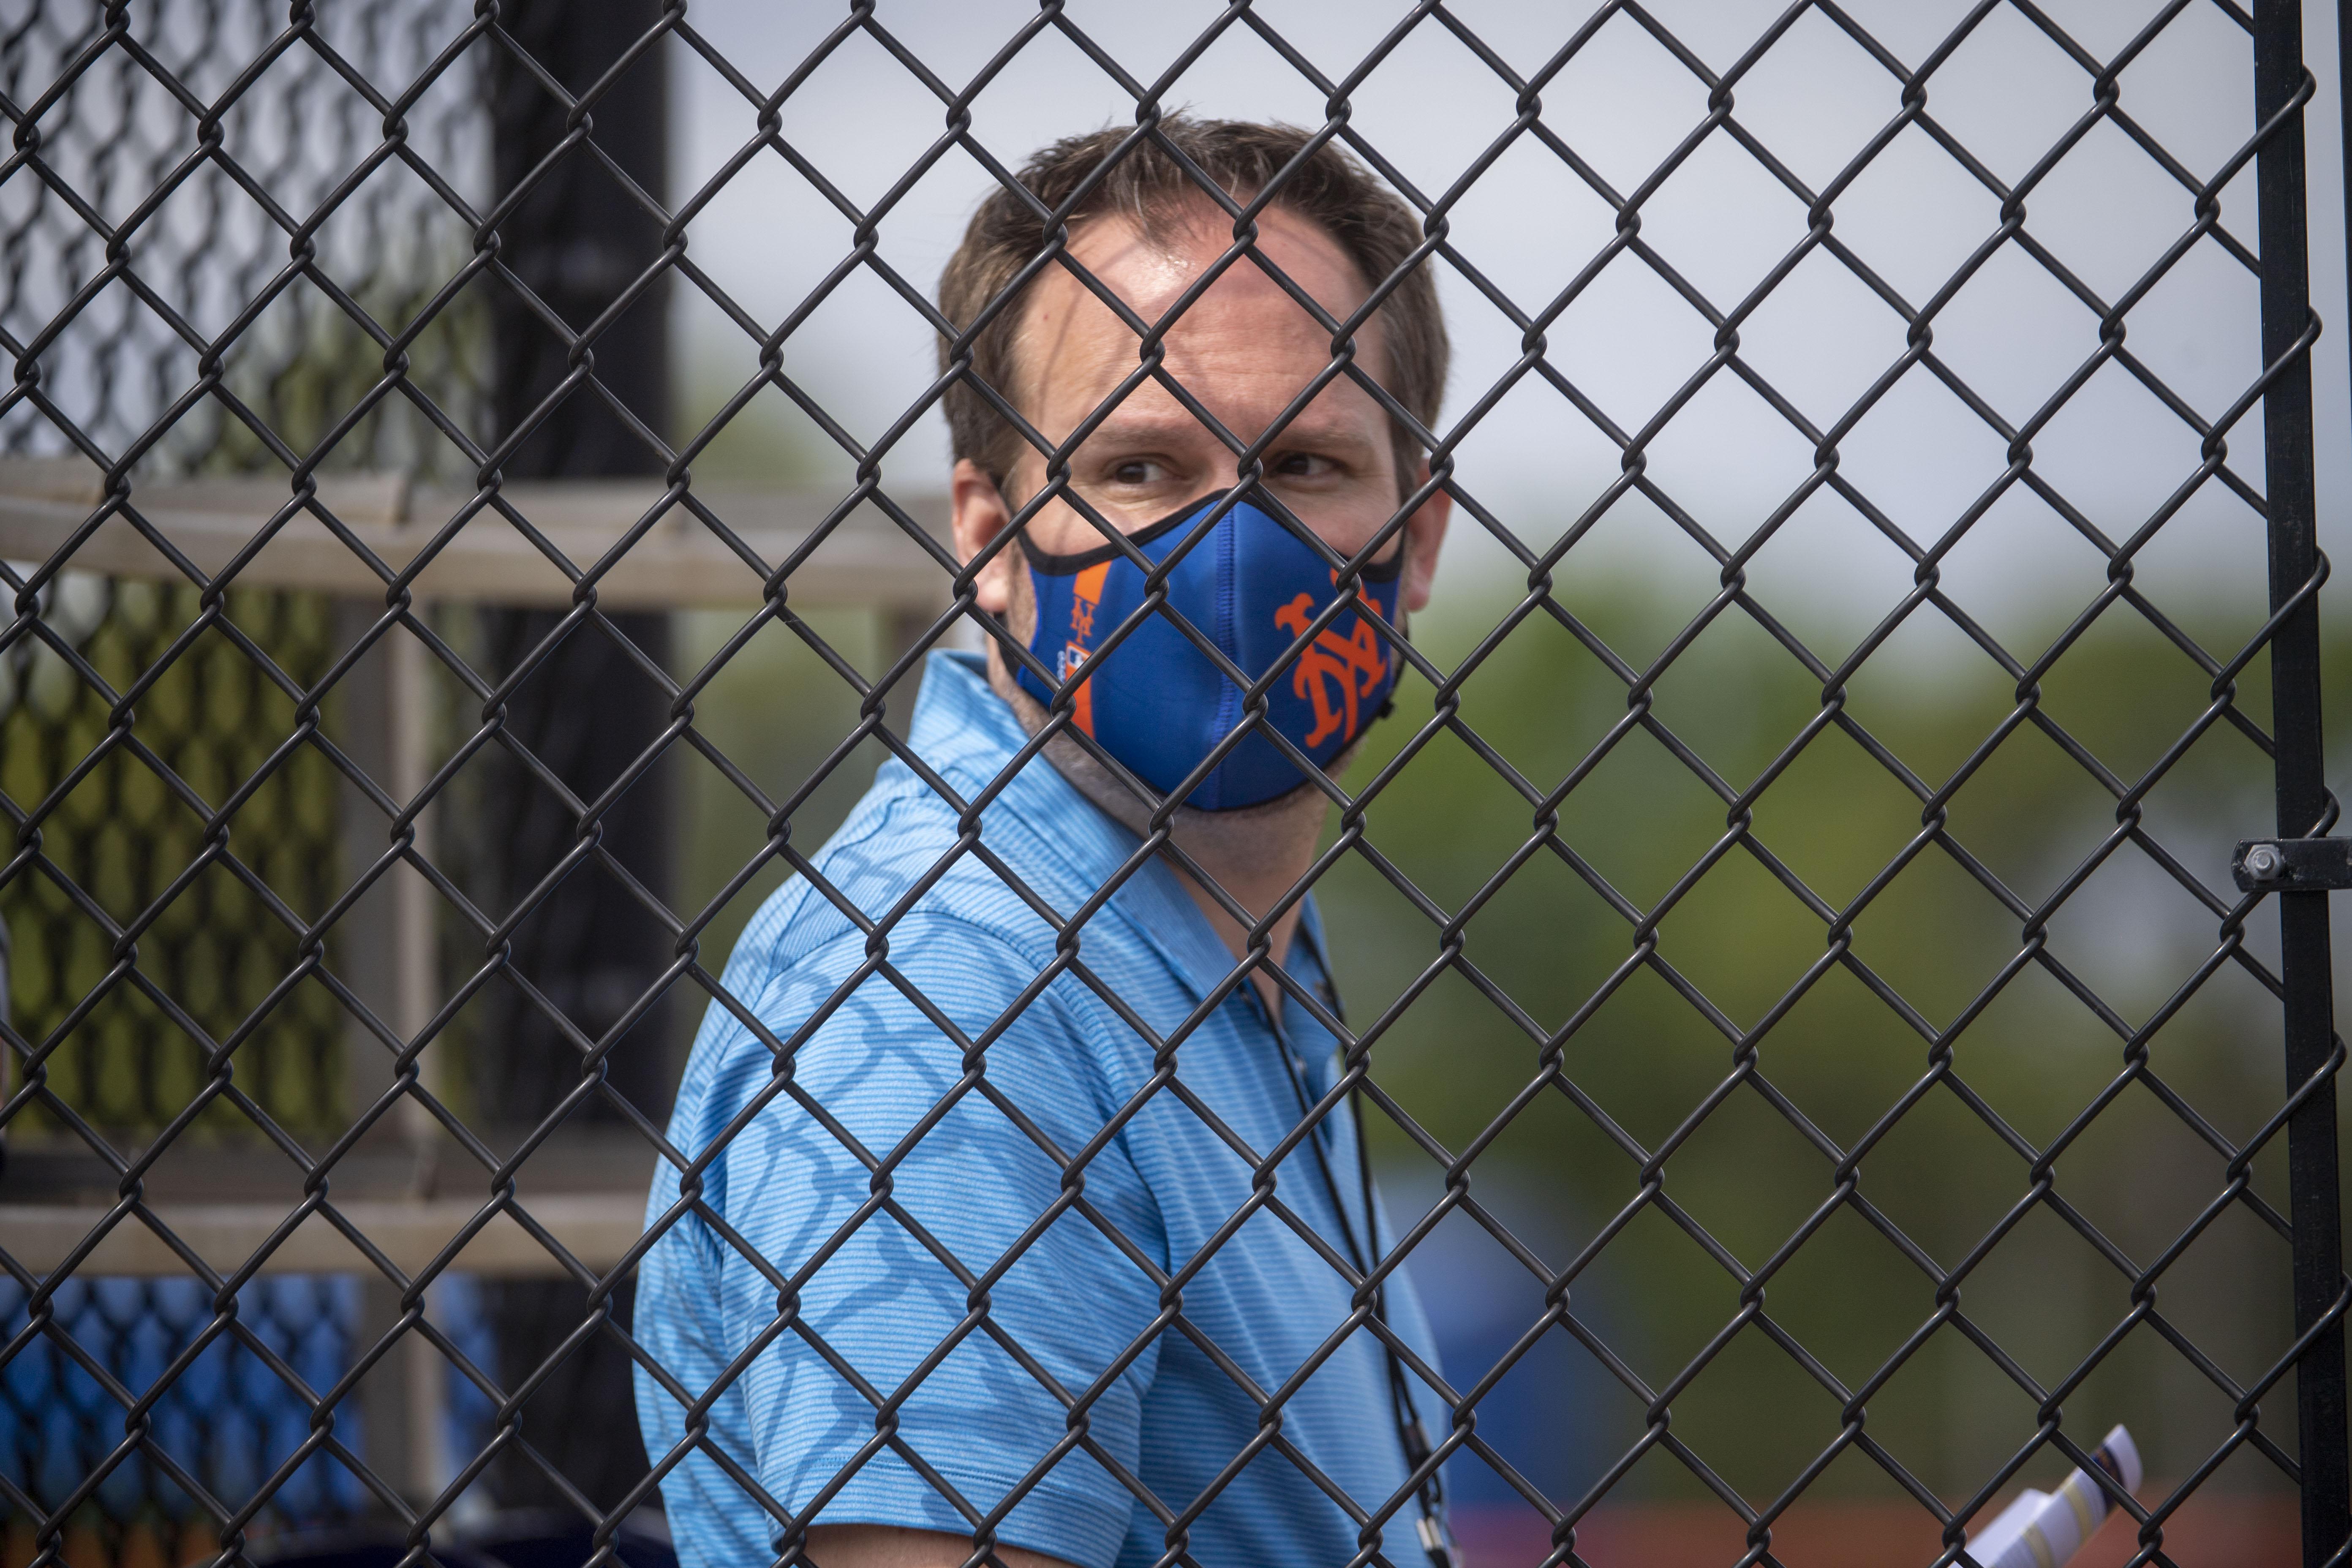 New York Mets Manager Zack Scott During Spring Training